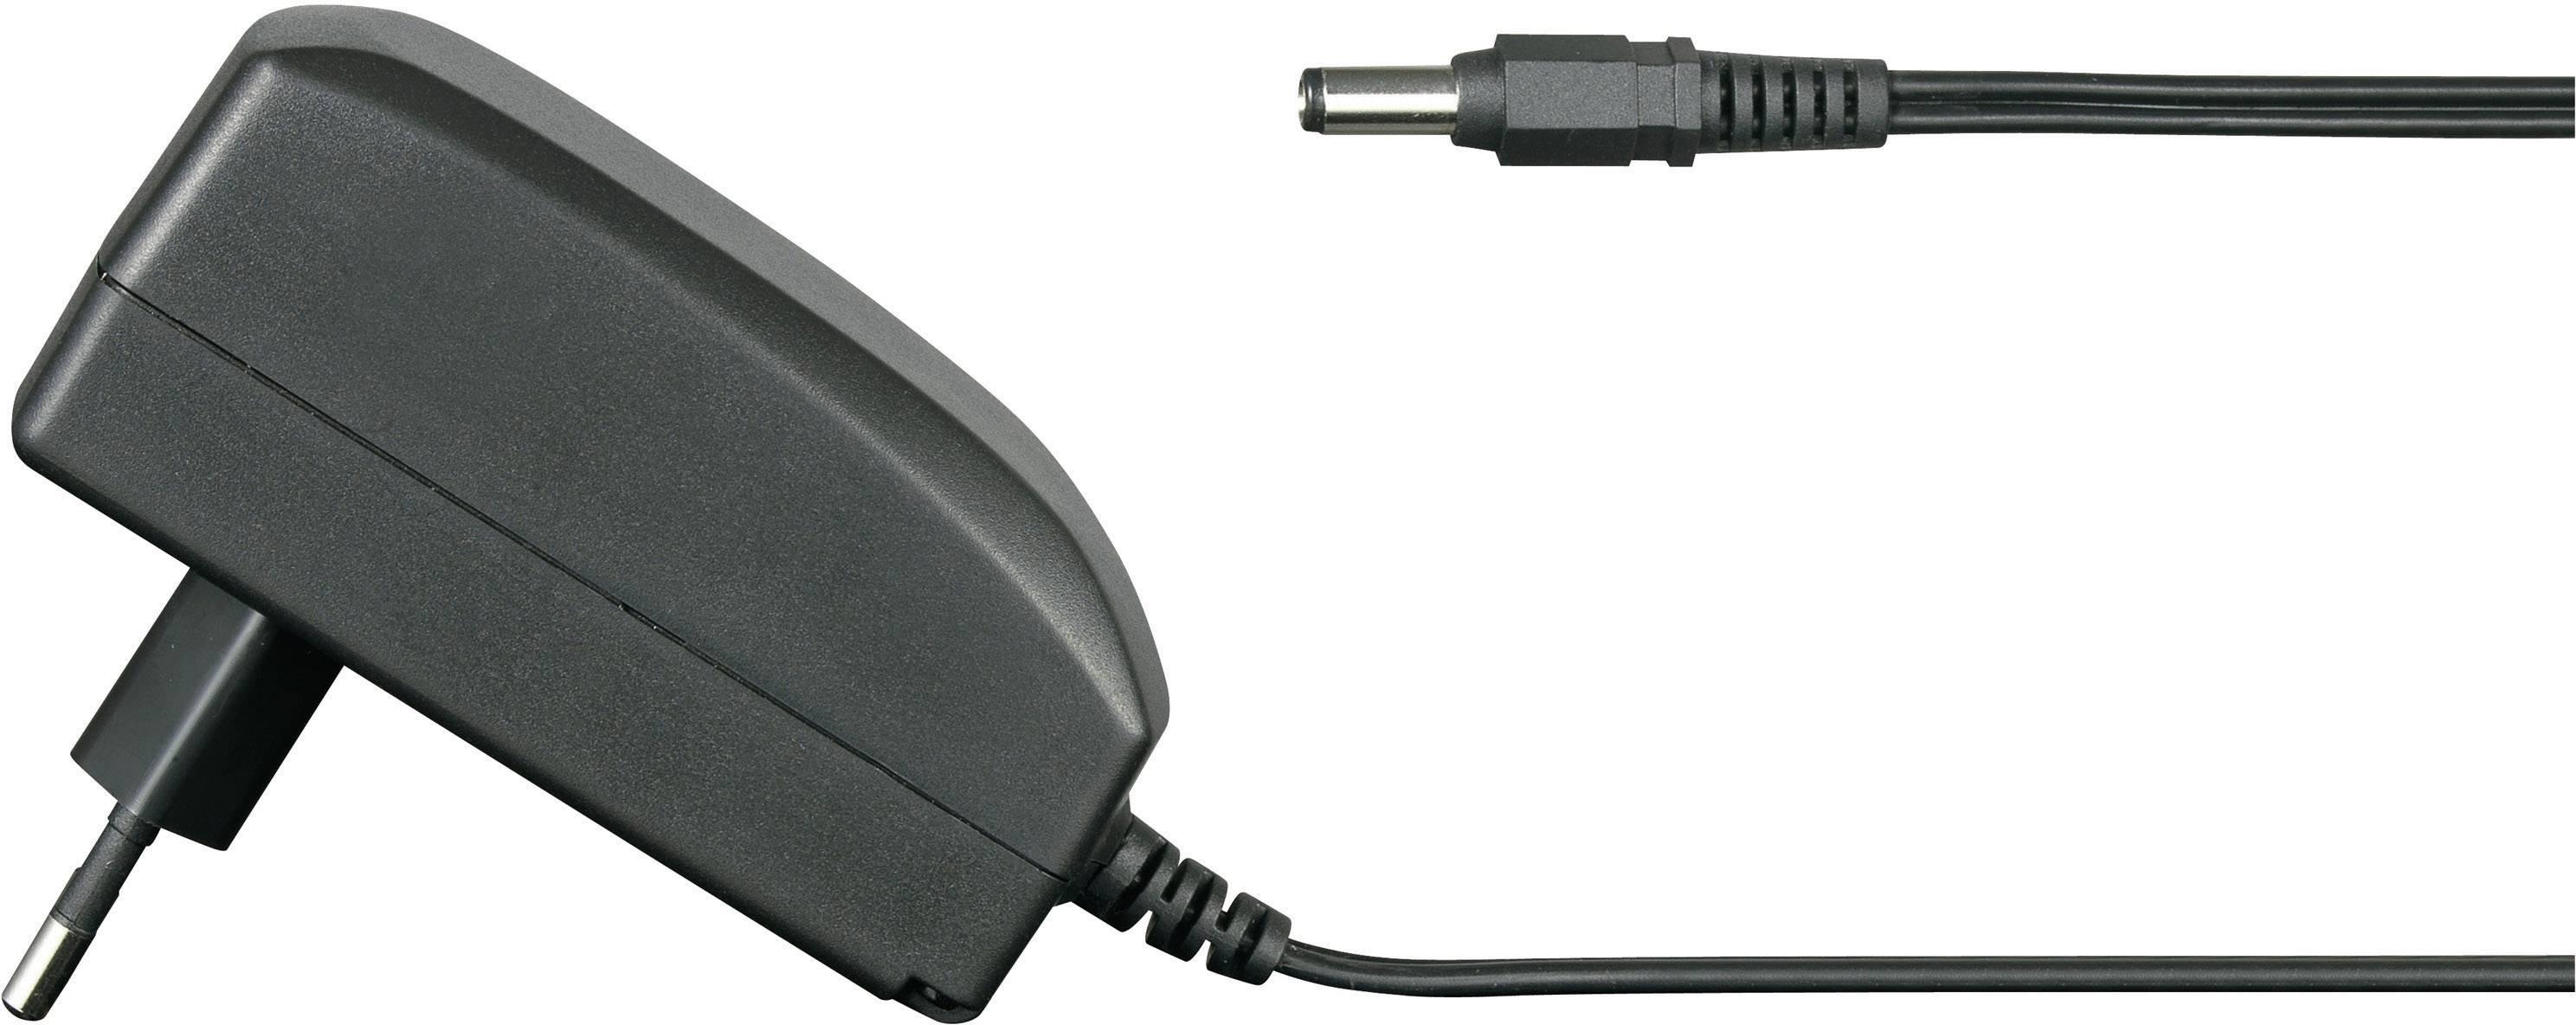 Síťový adaptér Voltcraft FPPS 12-27W, 12 V/DC, 27 W